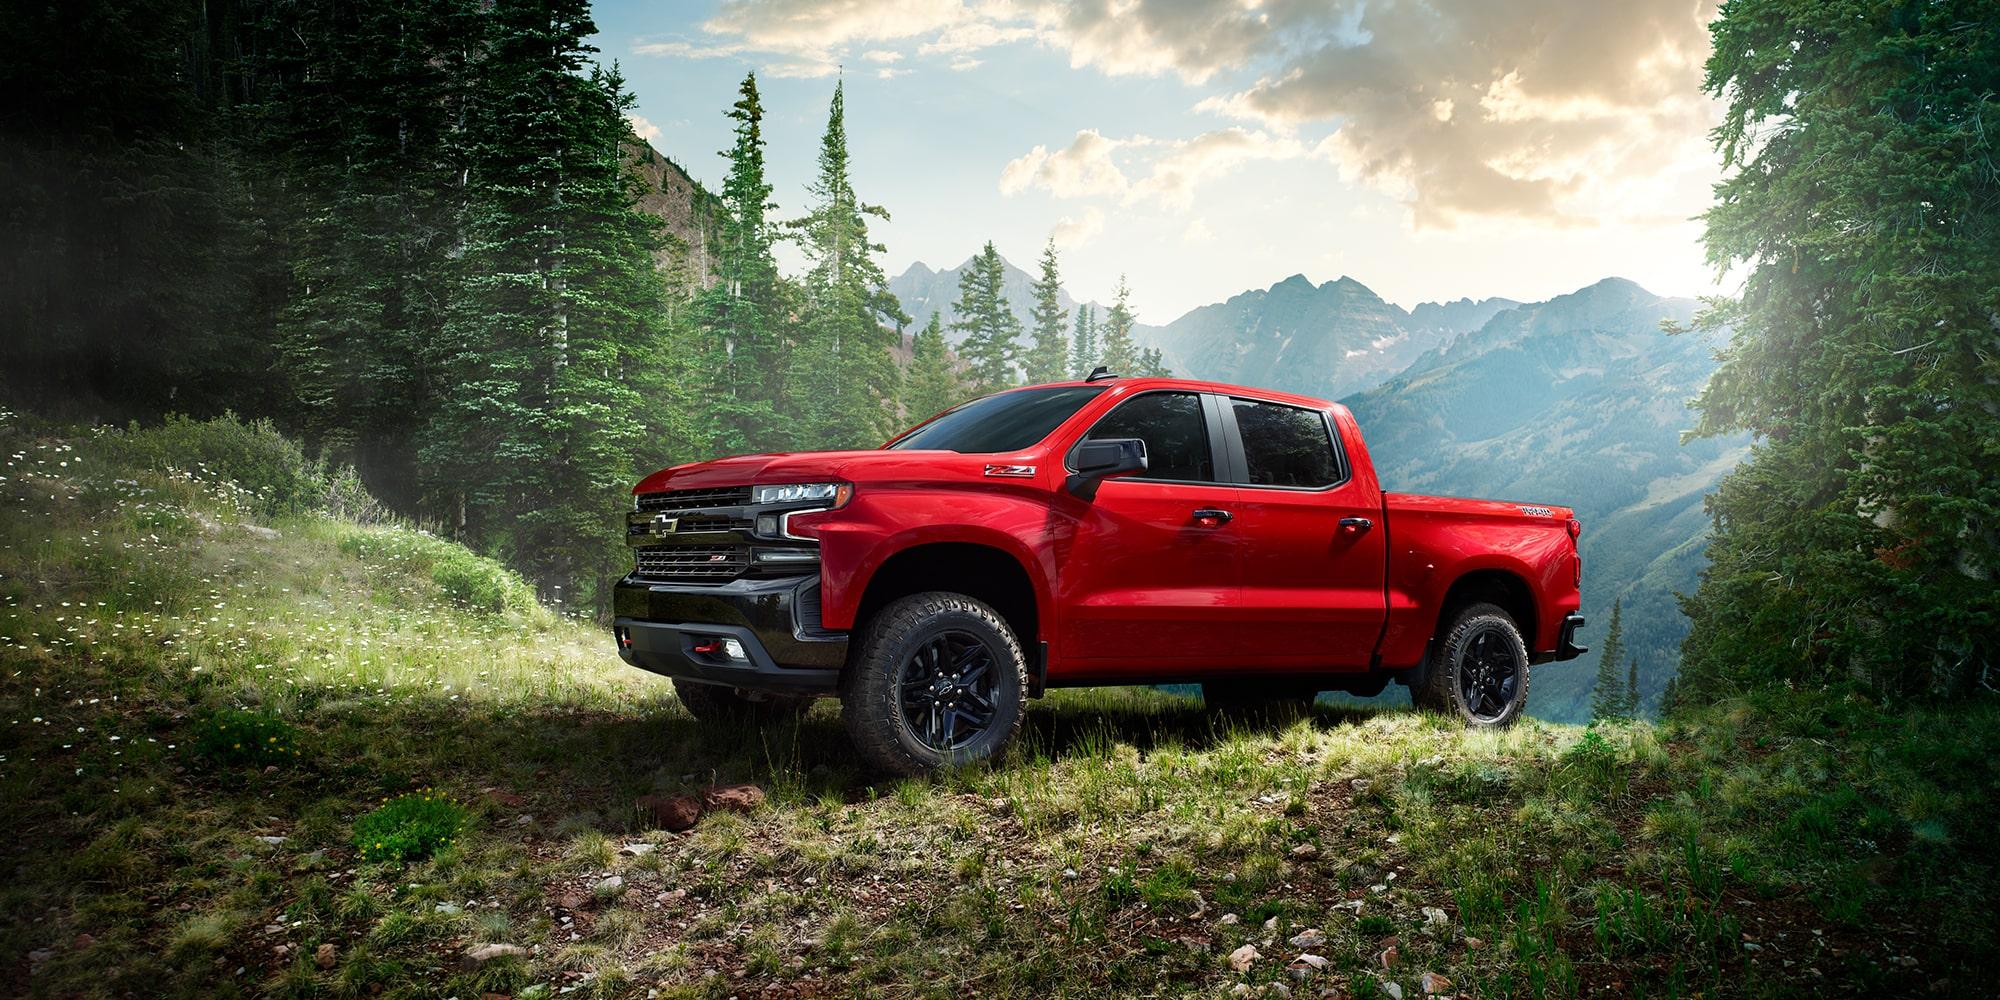 2019 Toyota Silverado 1500 Prizes - Lake Tahoe Trip